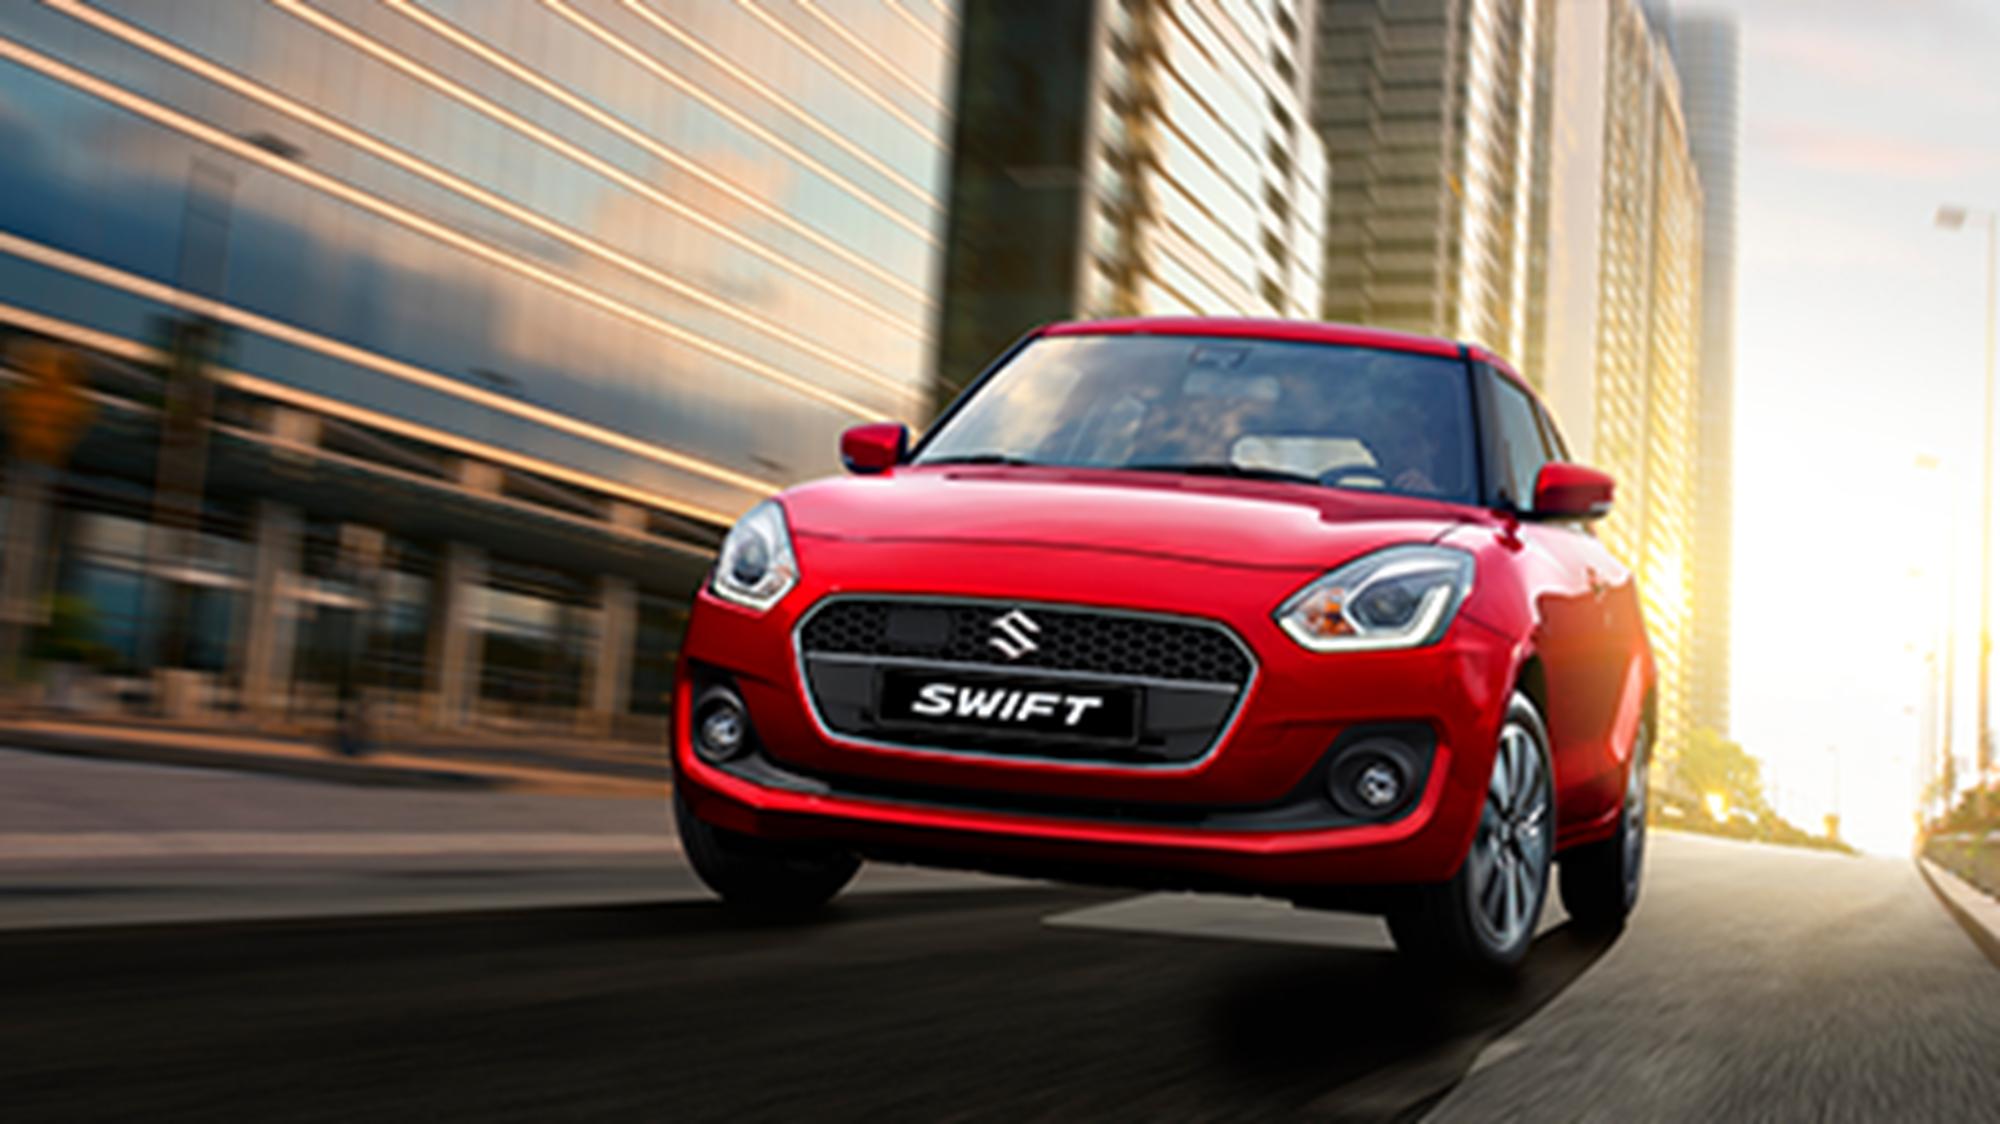 Suzuki Swift - Take It To The Next Level   Suzuki Cars UK